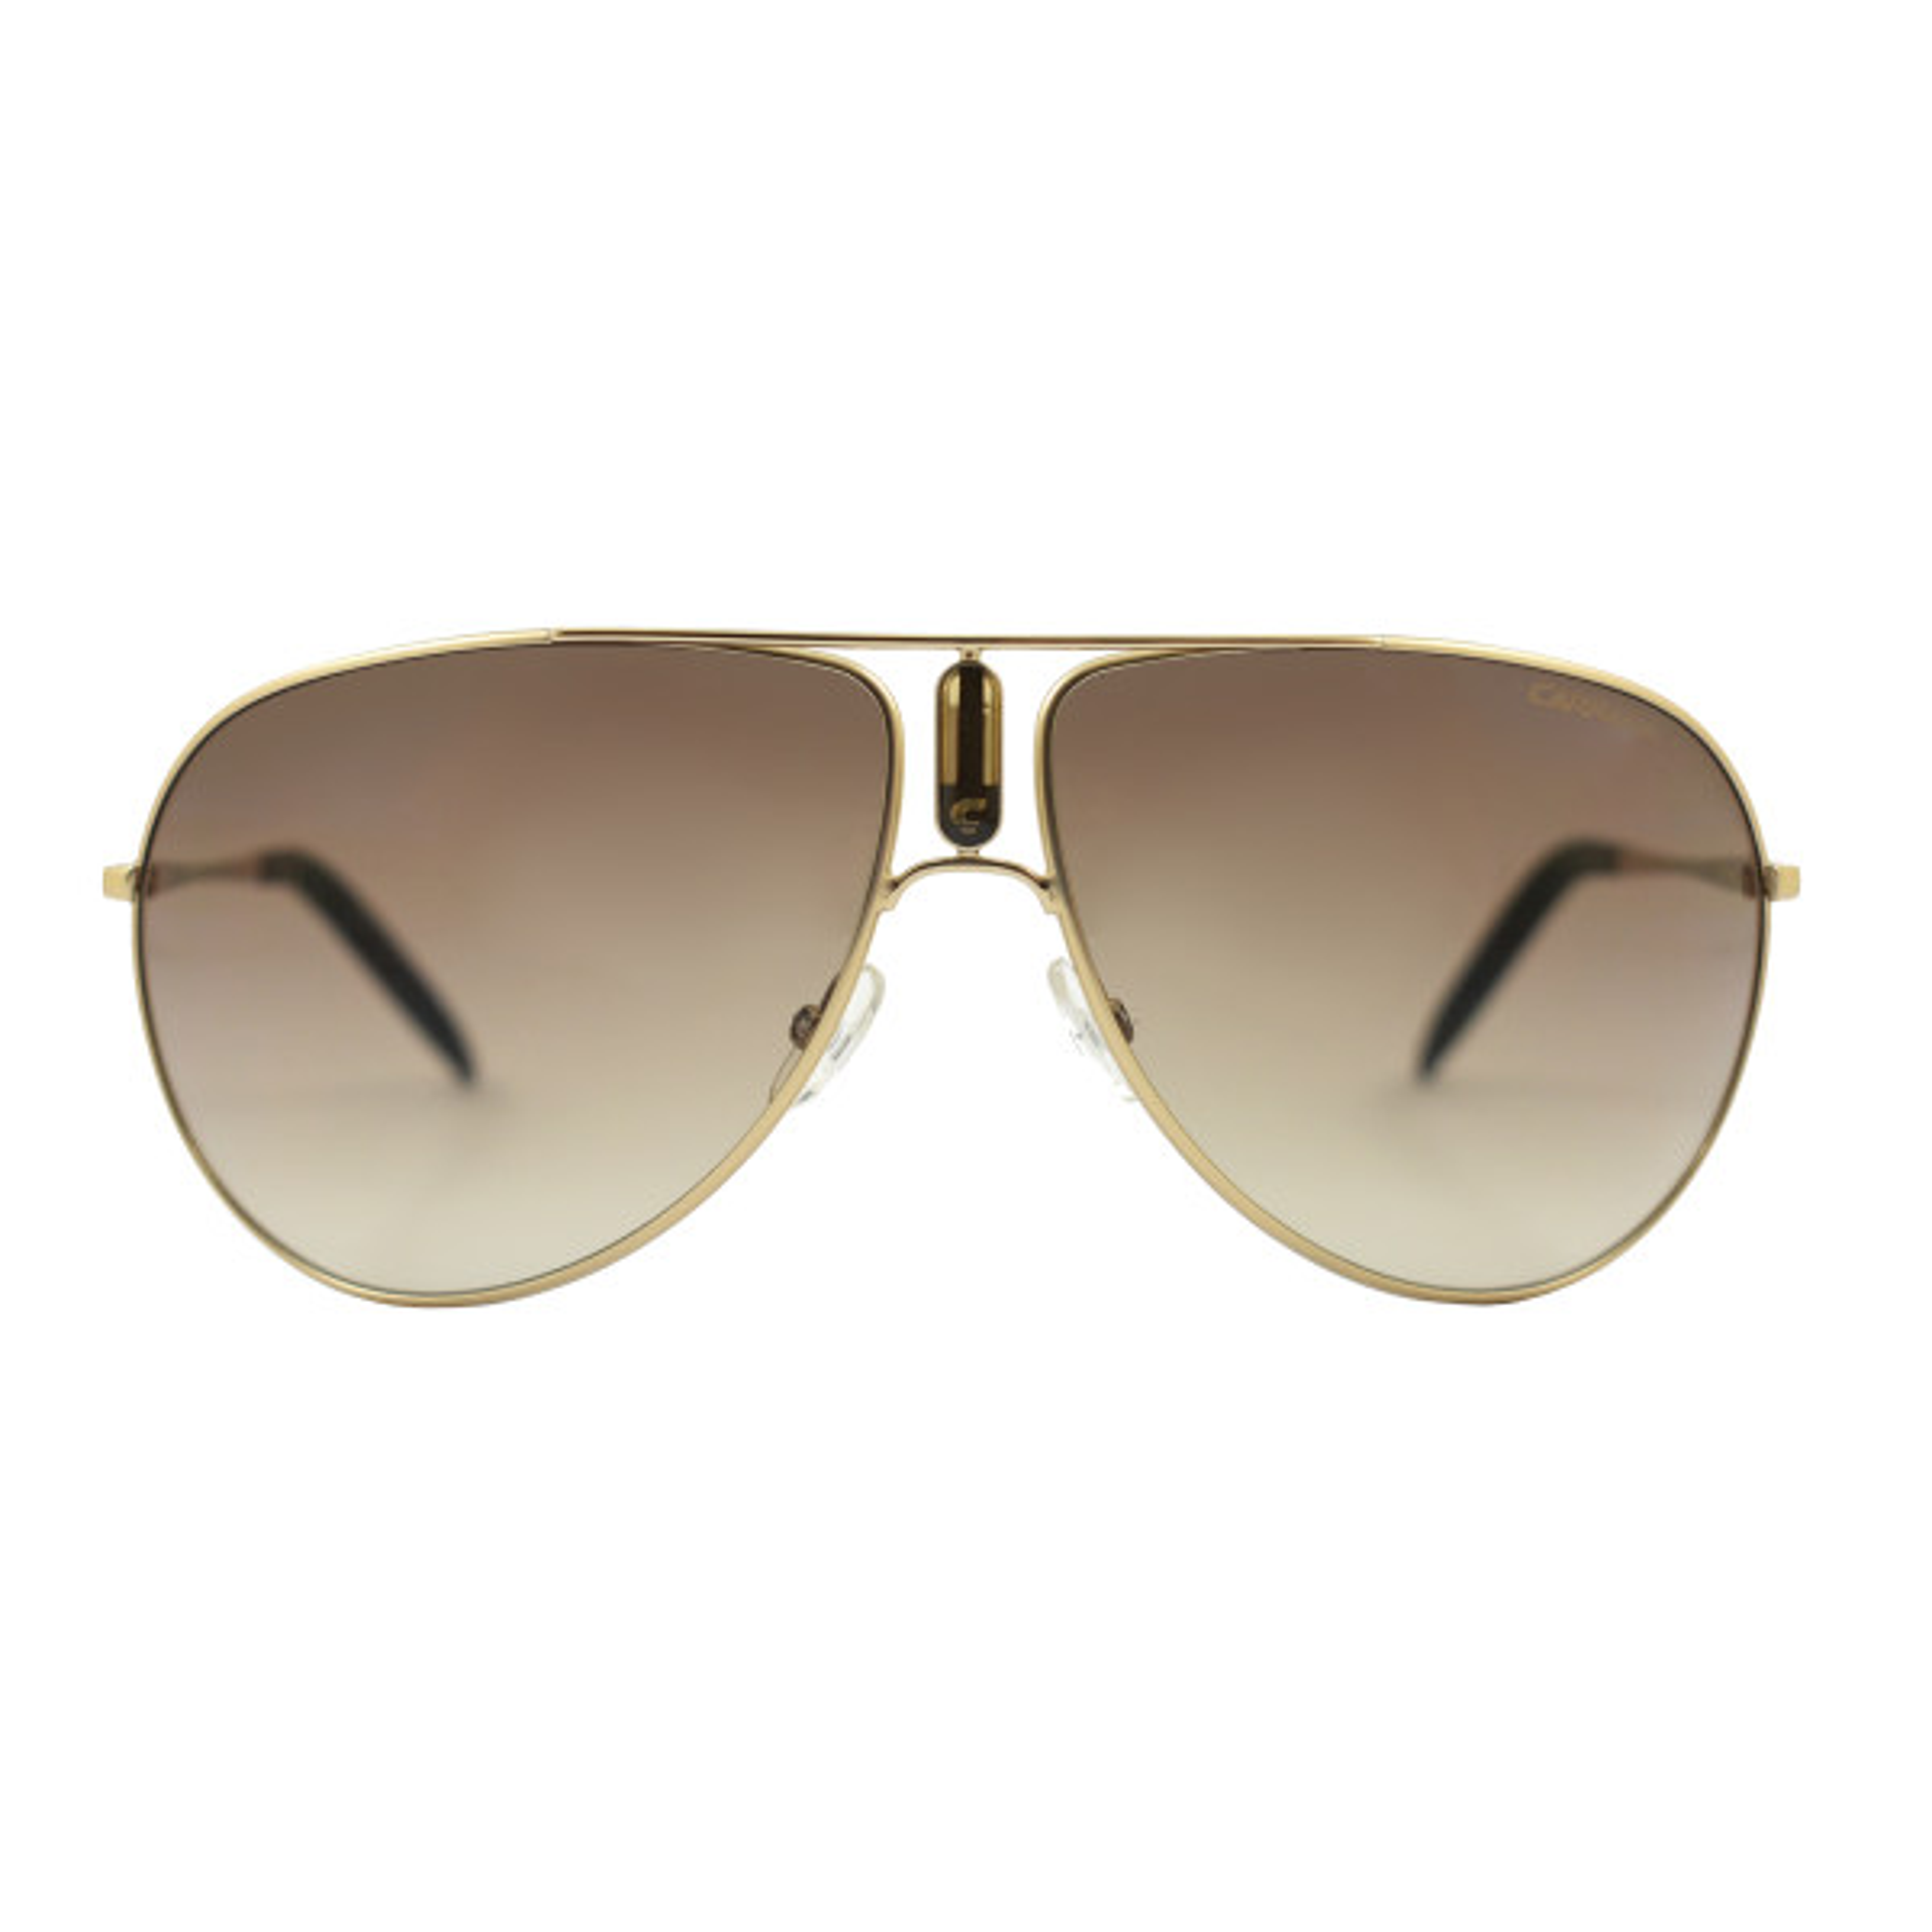 عینک آفتابی مردانه کاررا مدل GIPSY MWMYY